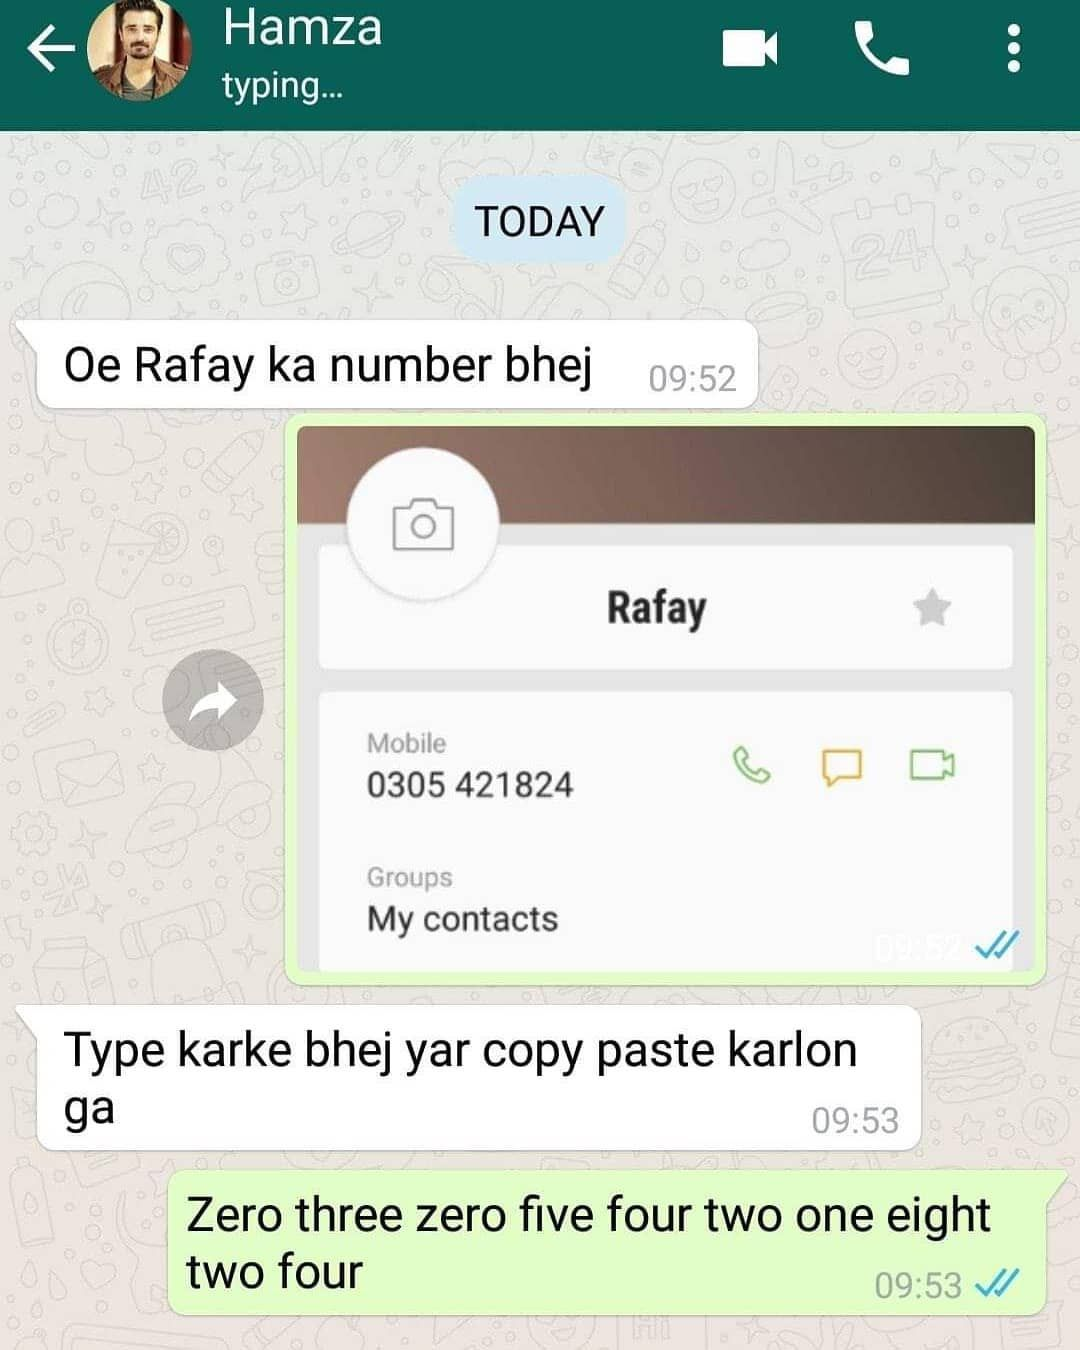 Apka Telented Bhai Memesdaily Memes Back Backtoposting Morningvibes Funny Memes Sarcastic Funny Joke Quote Very Funny Memes